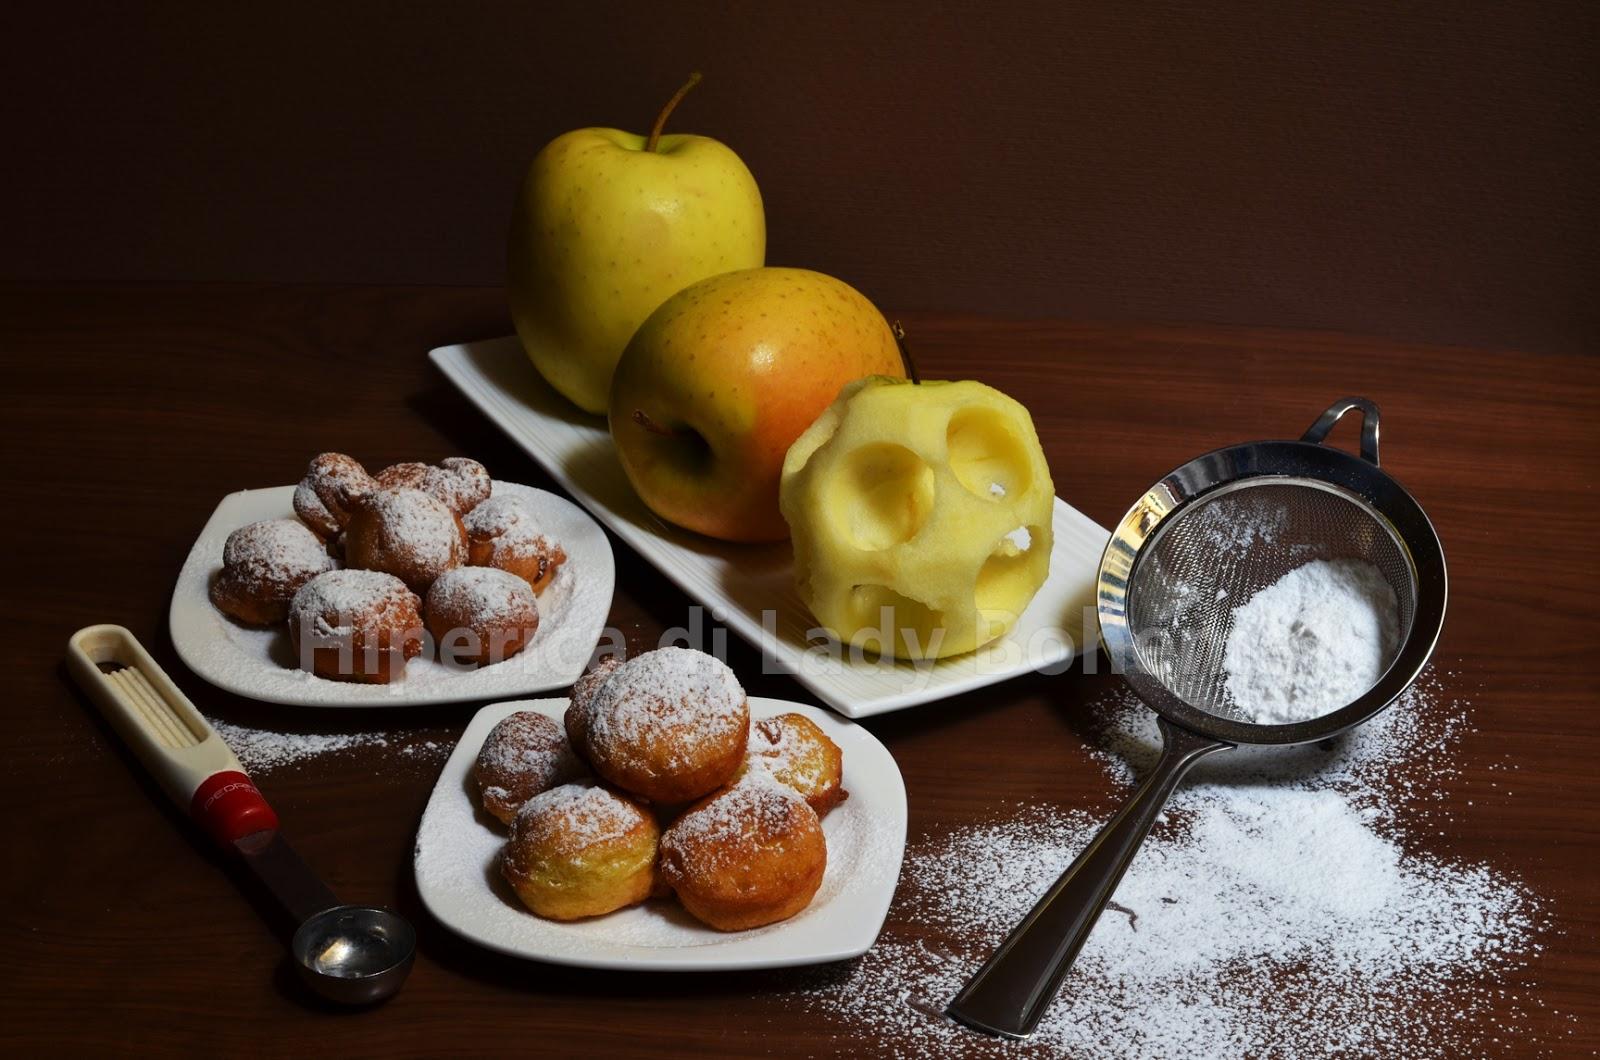 hiperica_lady_boheme_blog_cucina_ricette_gustose_facili_veloci_frittelle_di_mele_2